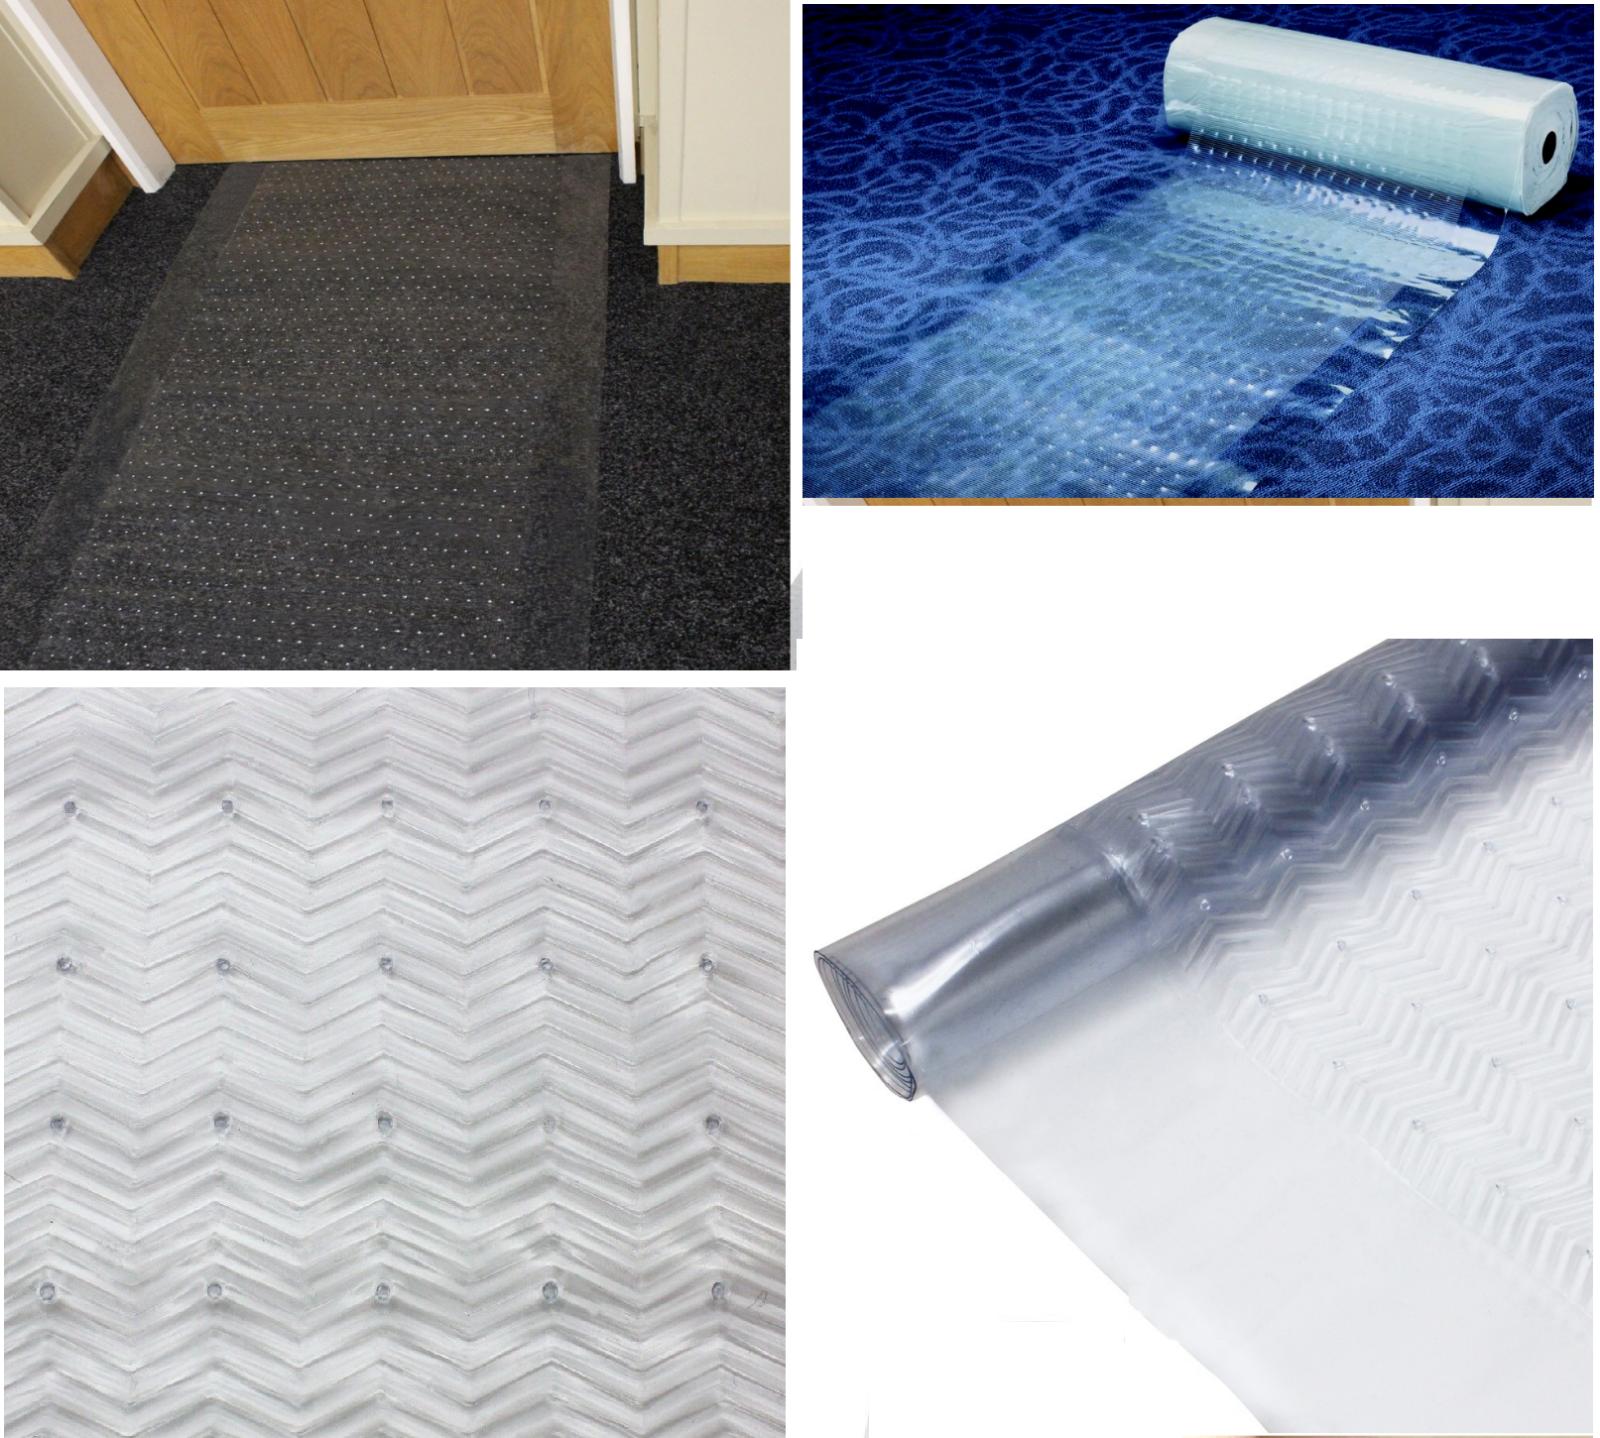 Carpet Protector Heavy Duty Vinyl Roll Clear Plastic Runner Office Hallway Mats 7 95 Picclick Uk